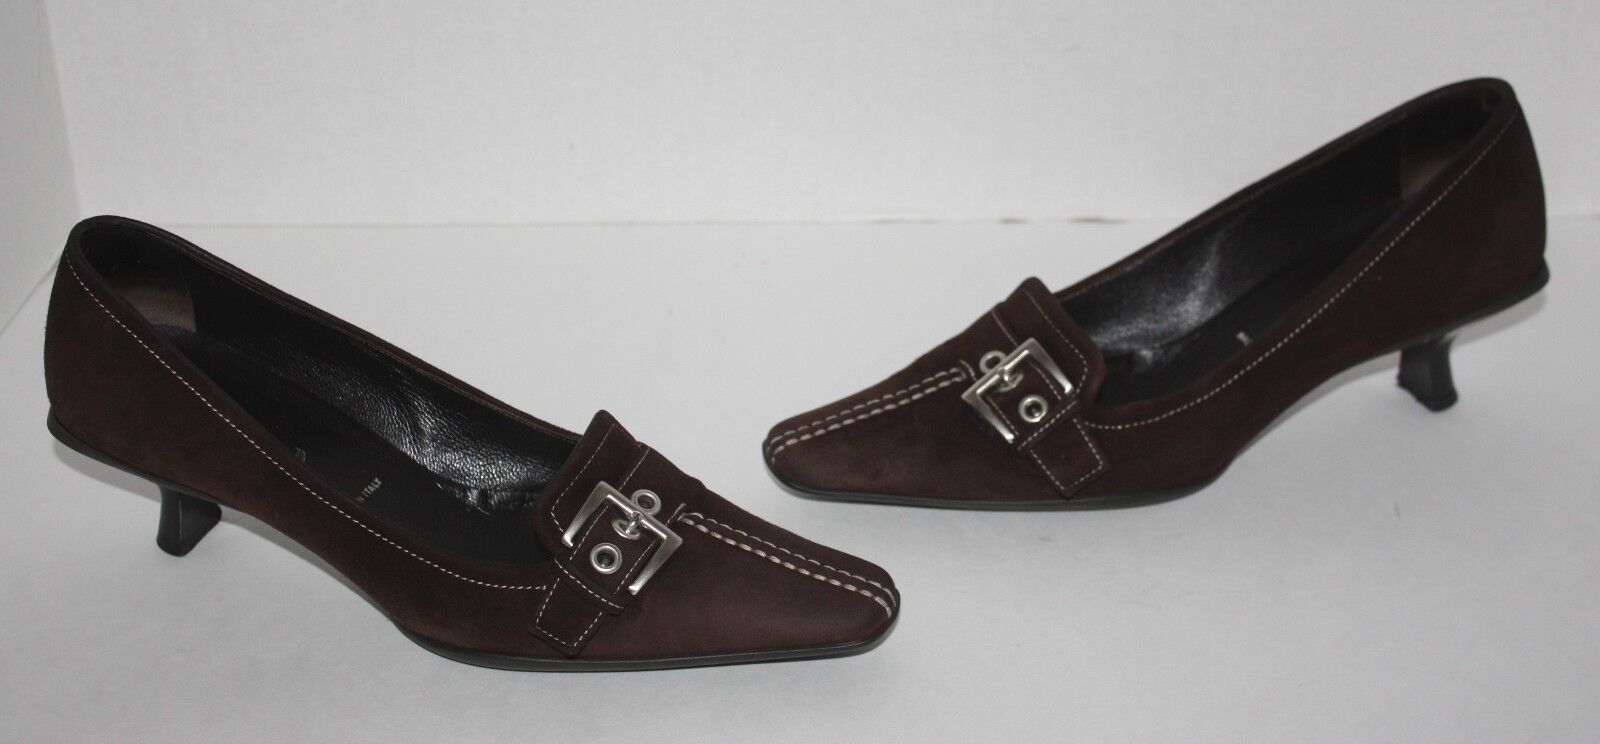 damen PRADA braun Suede Leather Classic Buckle Pumps Heels Größe 36   US 6